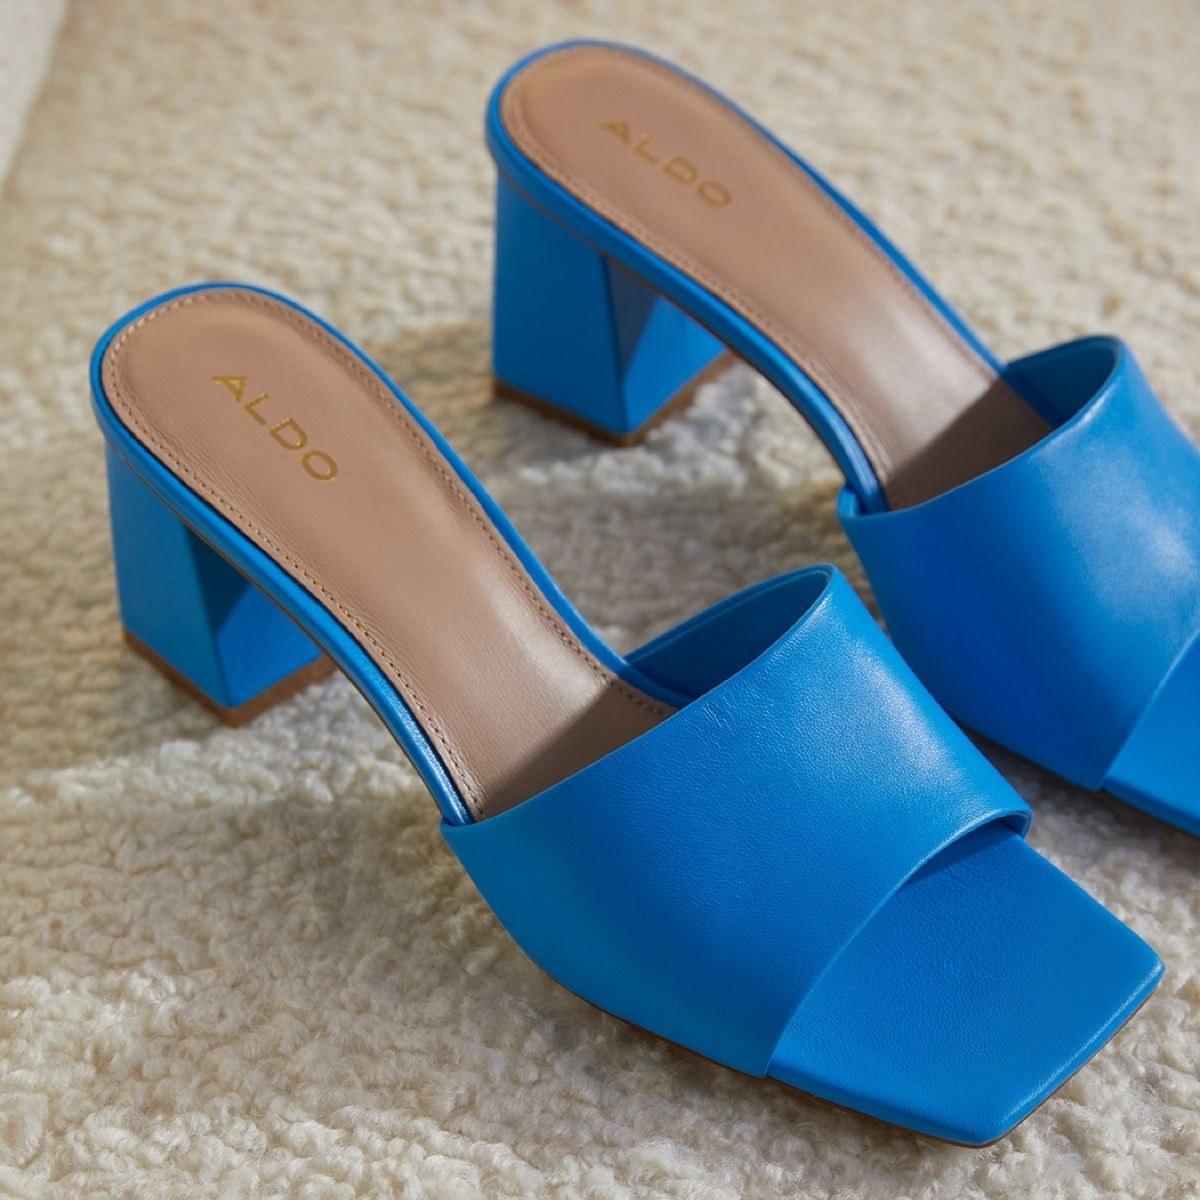 the blue sandals